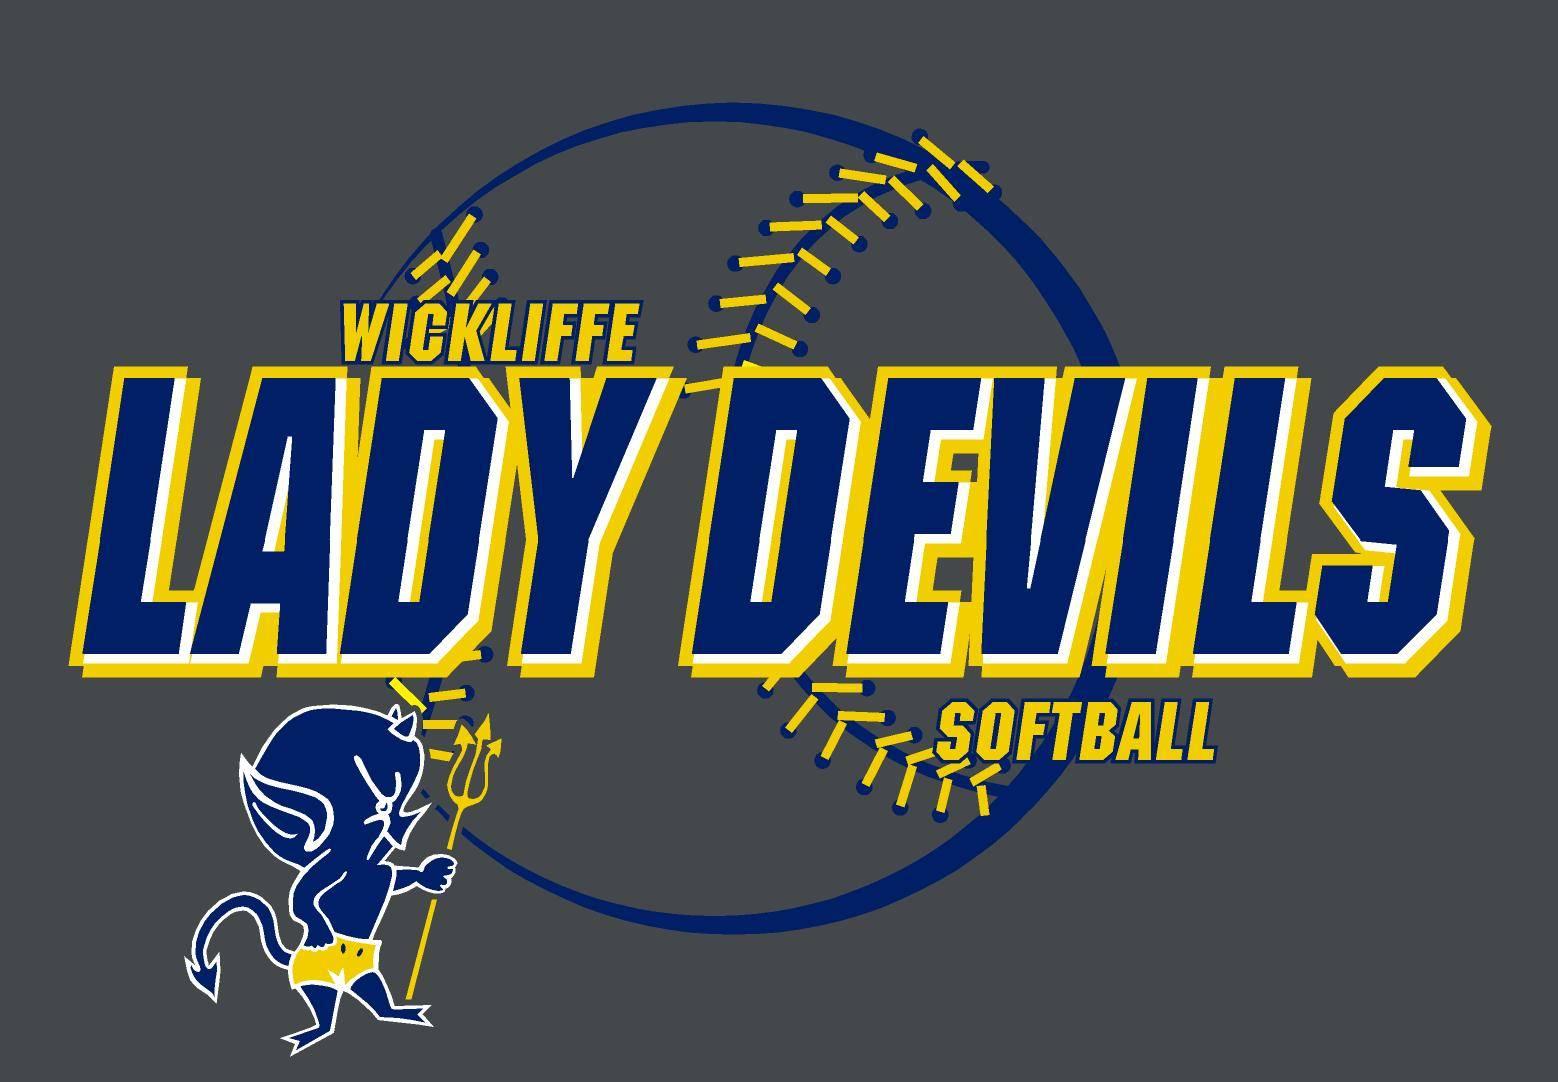 Lady Devils Softball